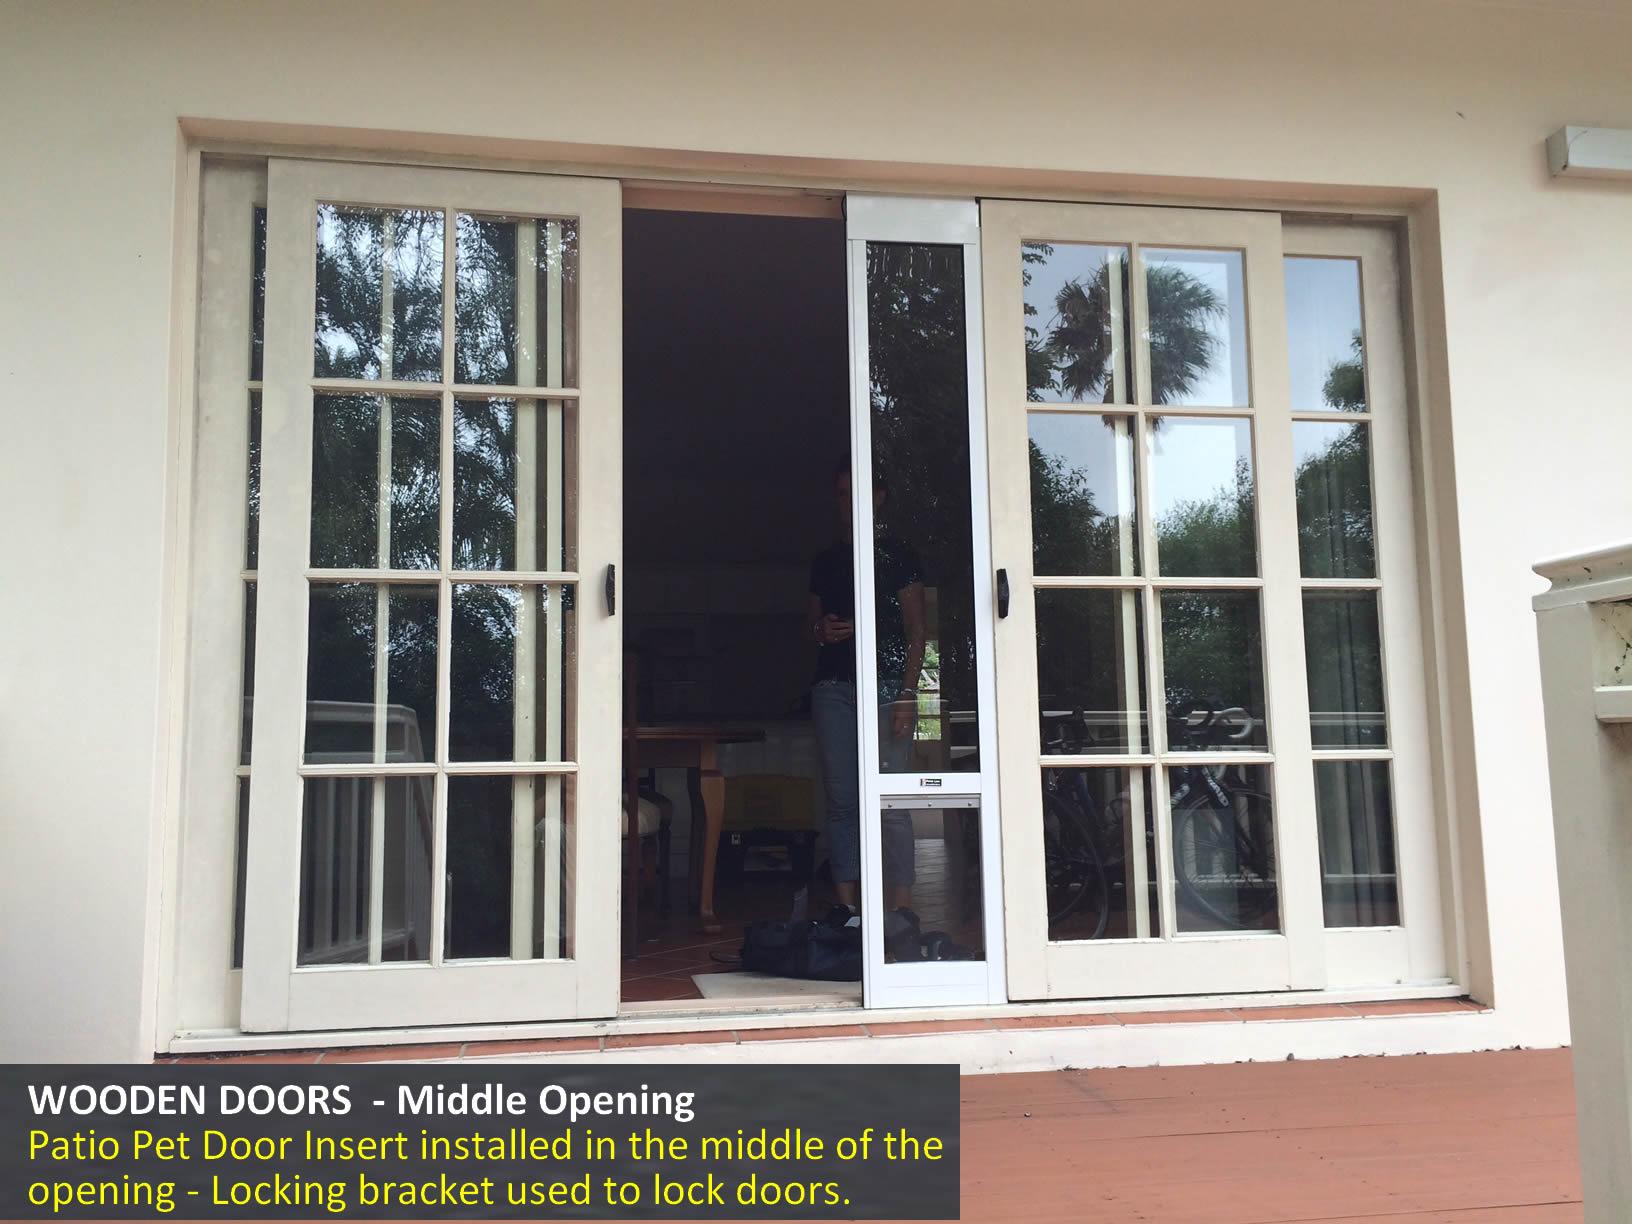 Wooden Doors - Middle Opening